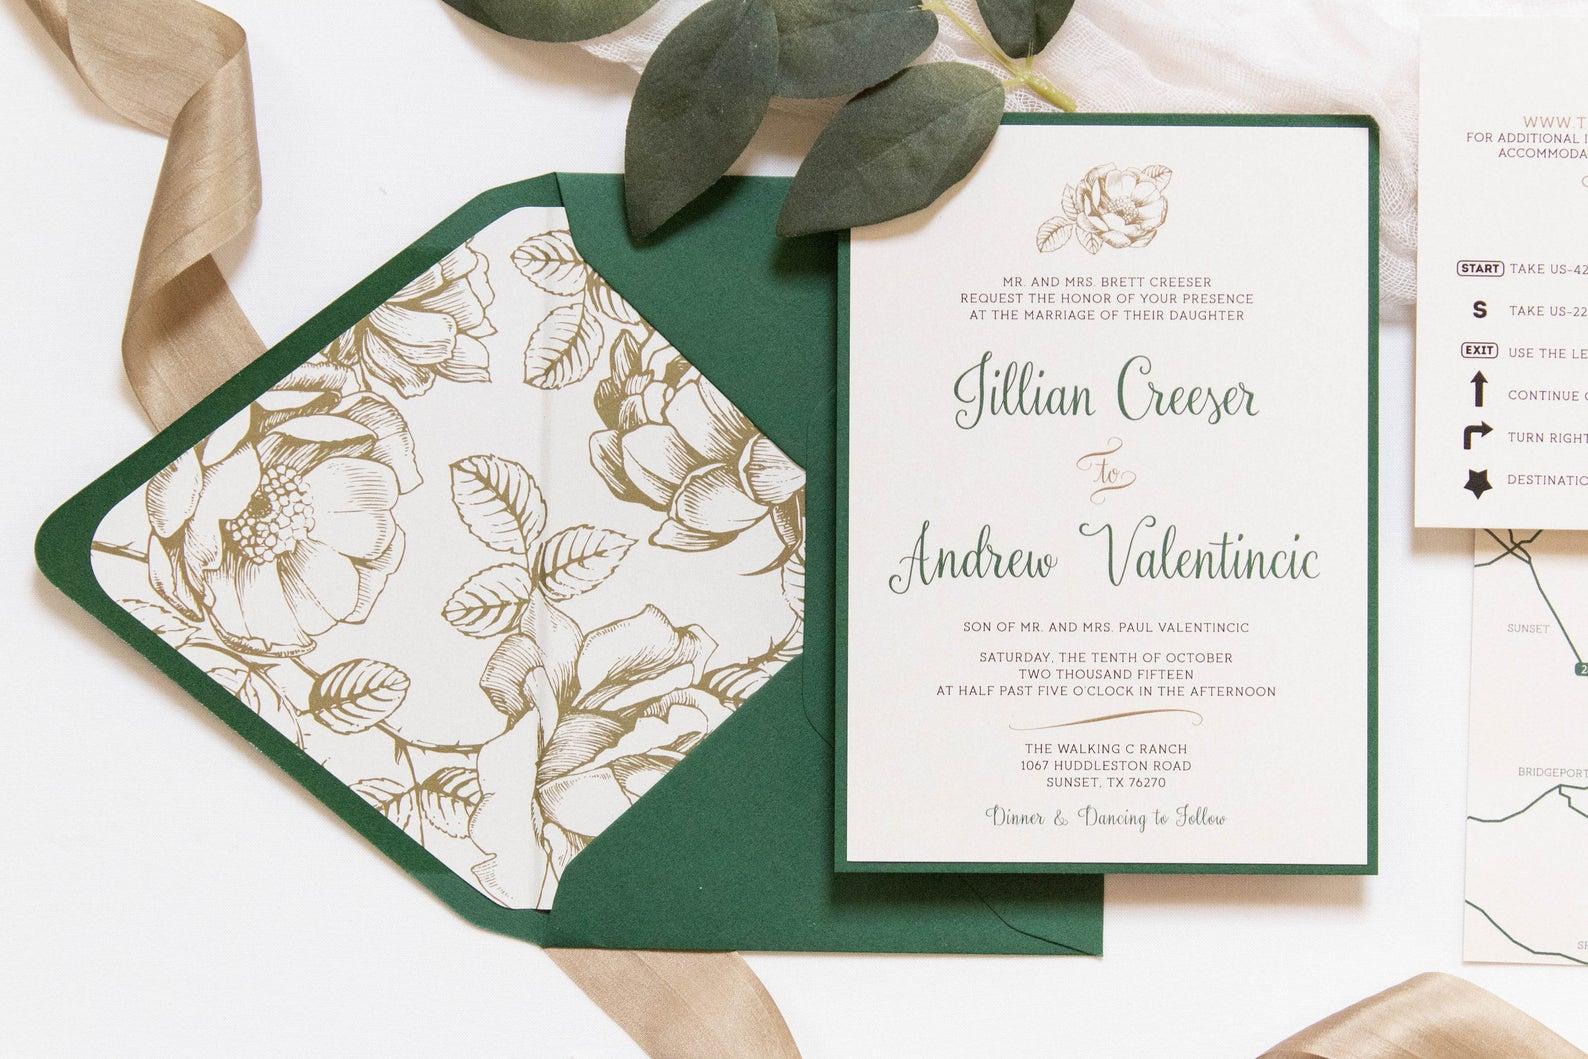 Brown Fox Creative wedding invitations